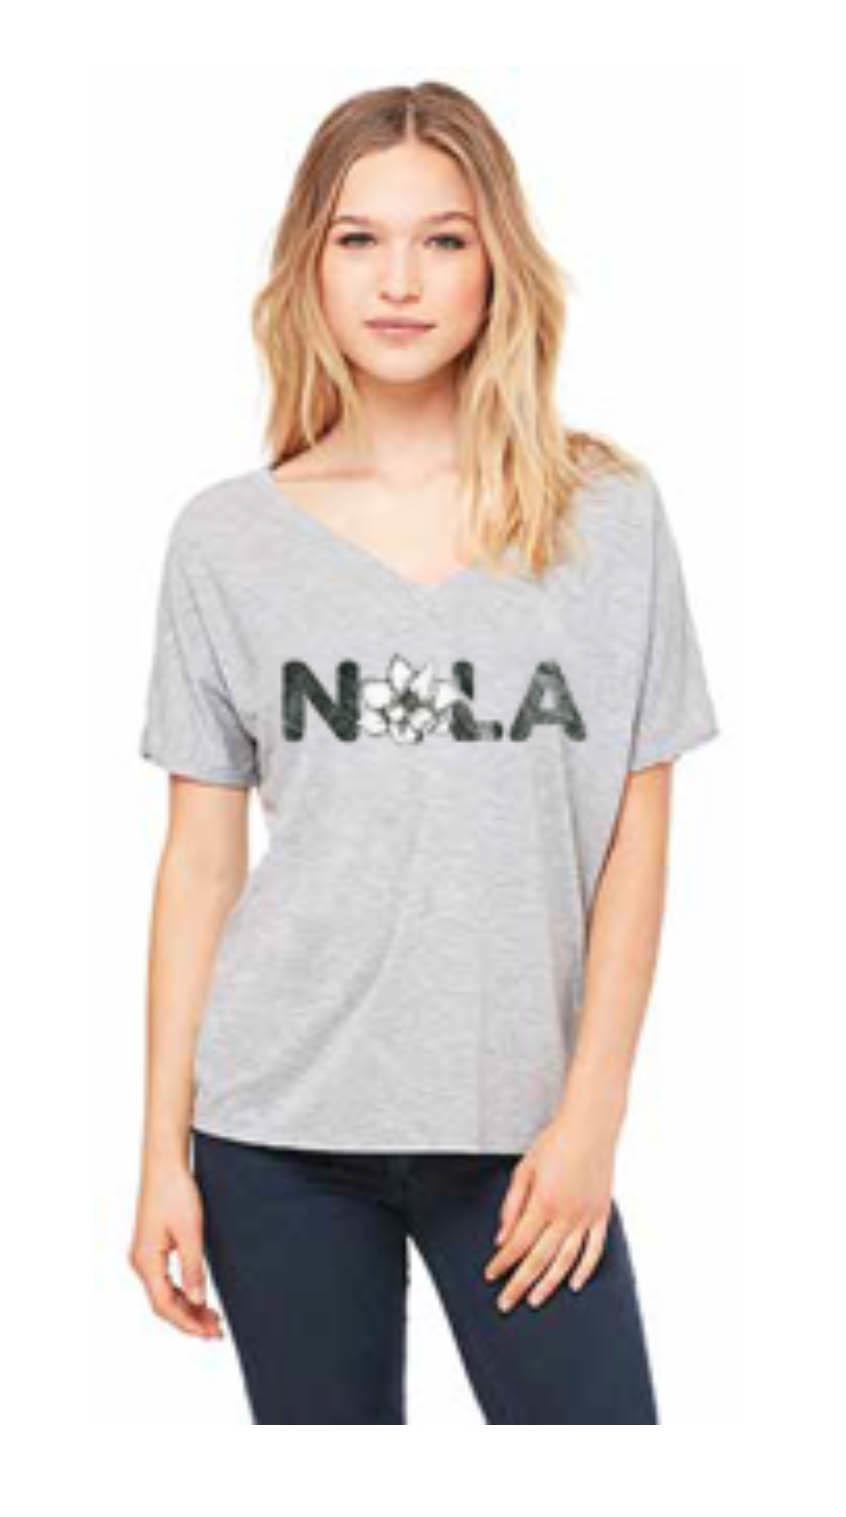 NOLA Magnolia Short Sleeve Adult V-Neck Heather Grey -